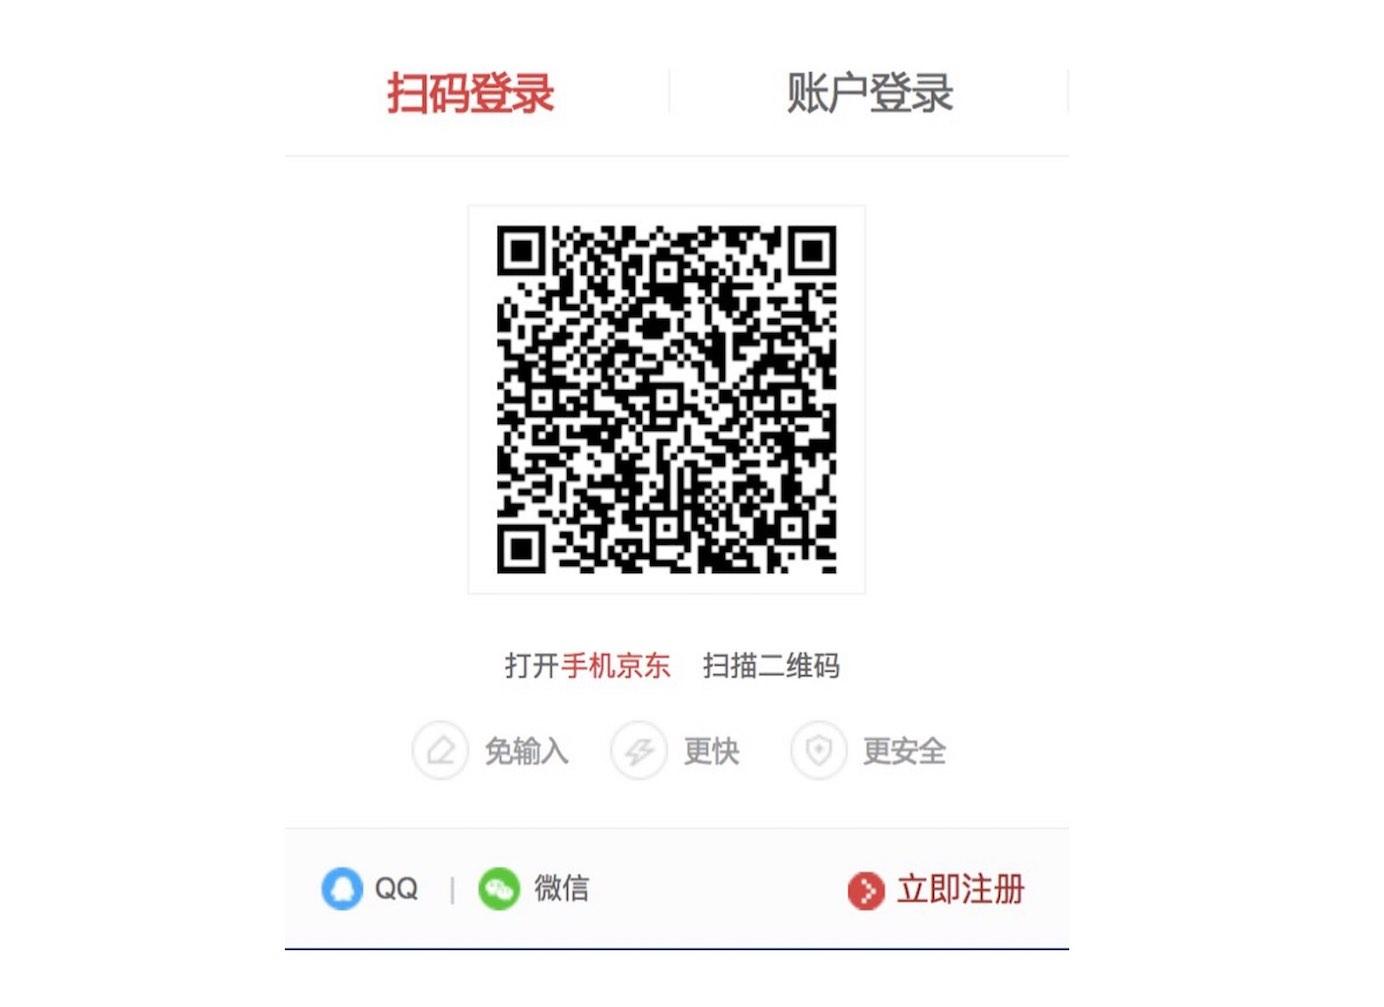 JD QR code